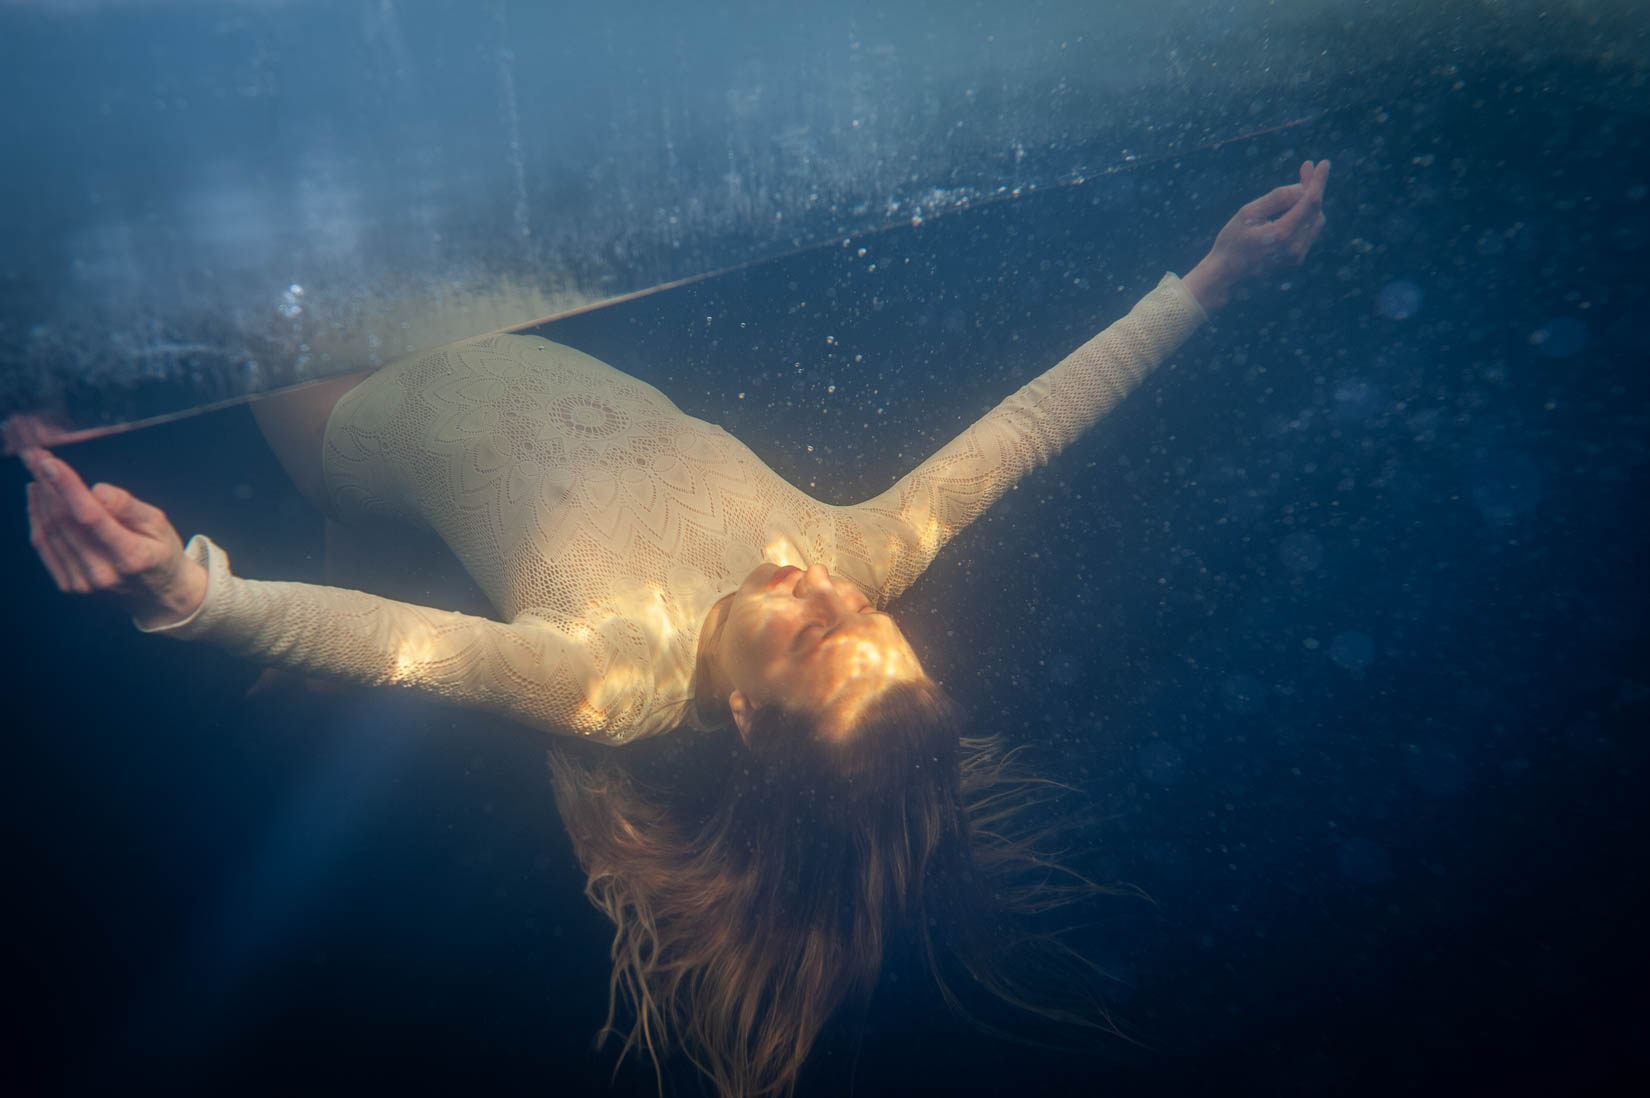 Photographer: Florence Venet